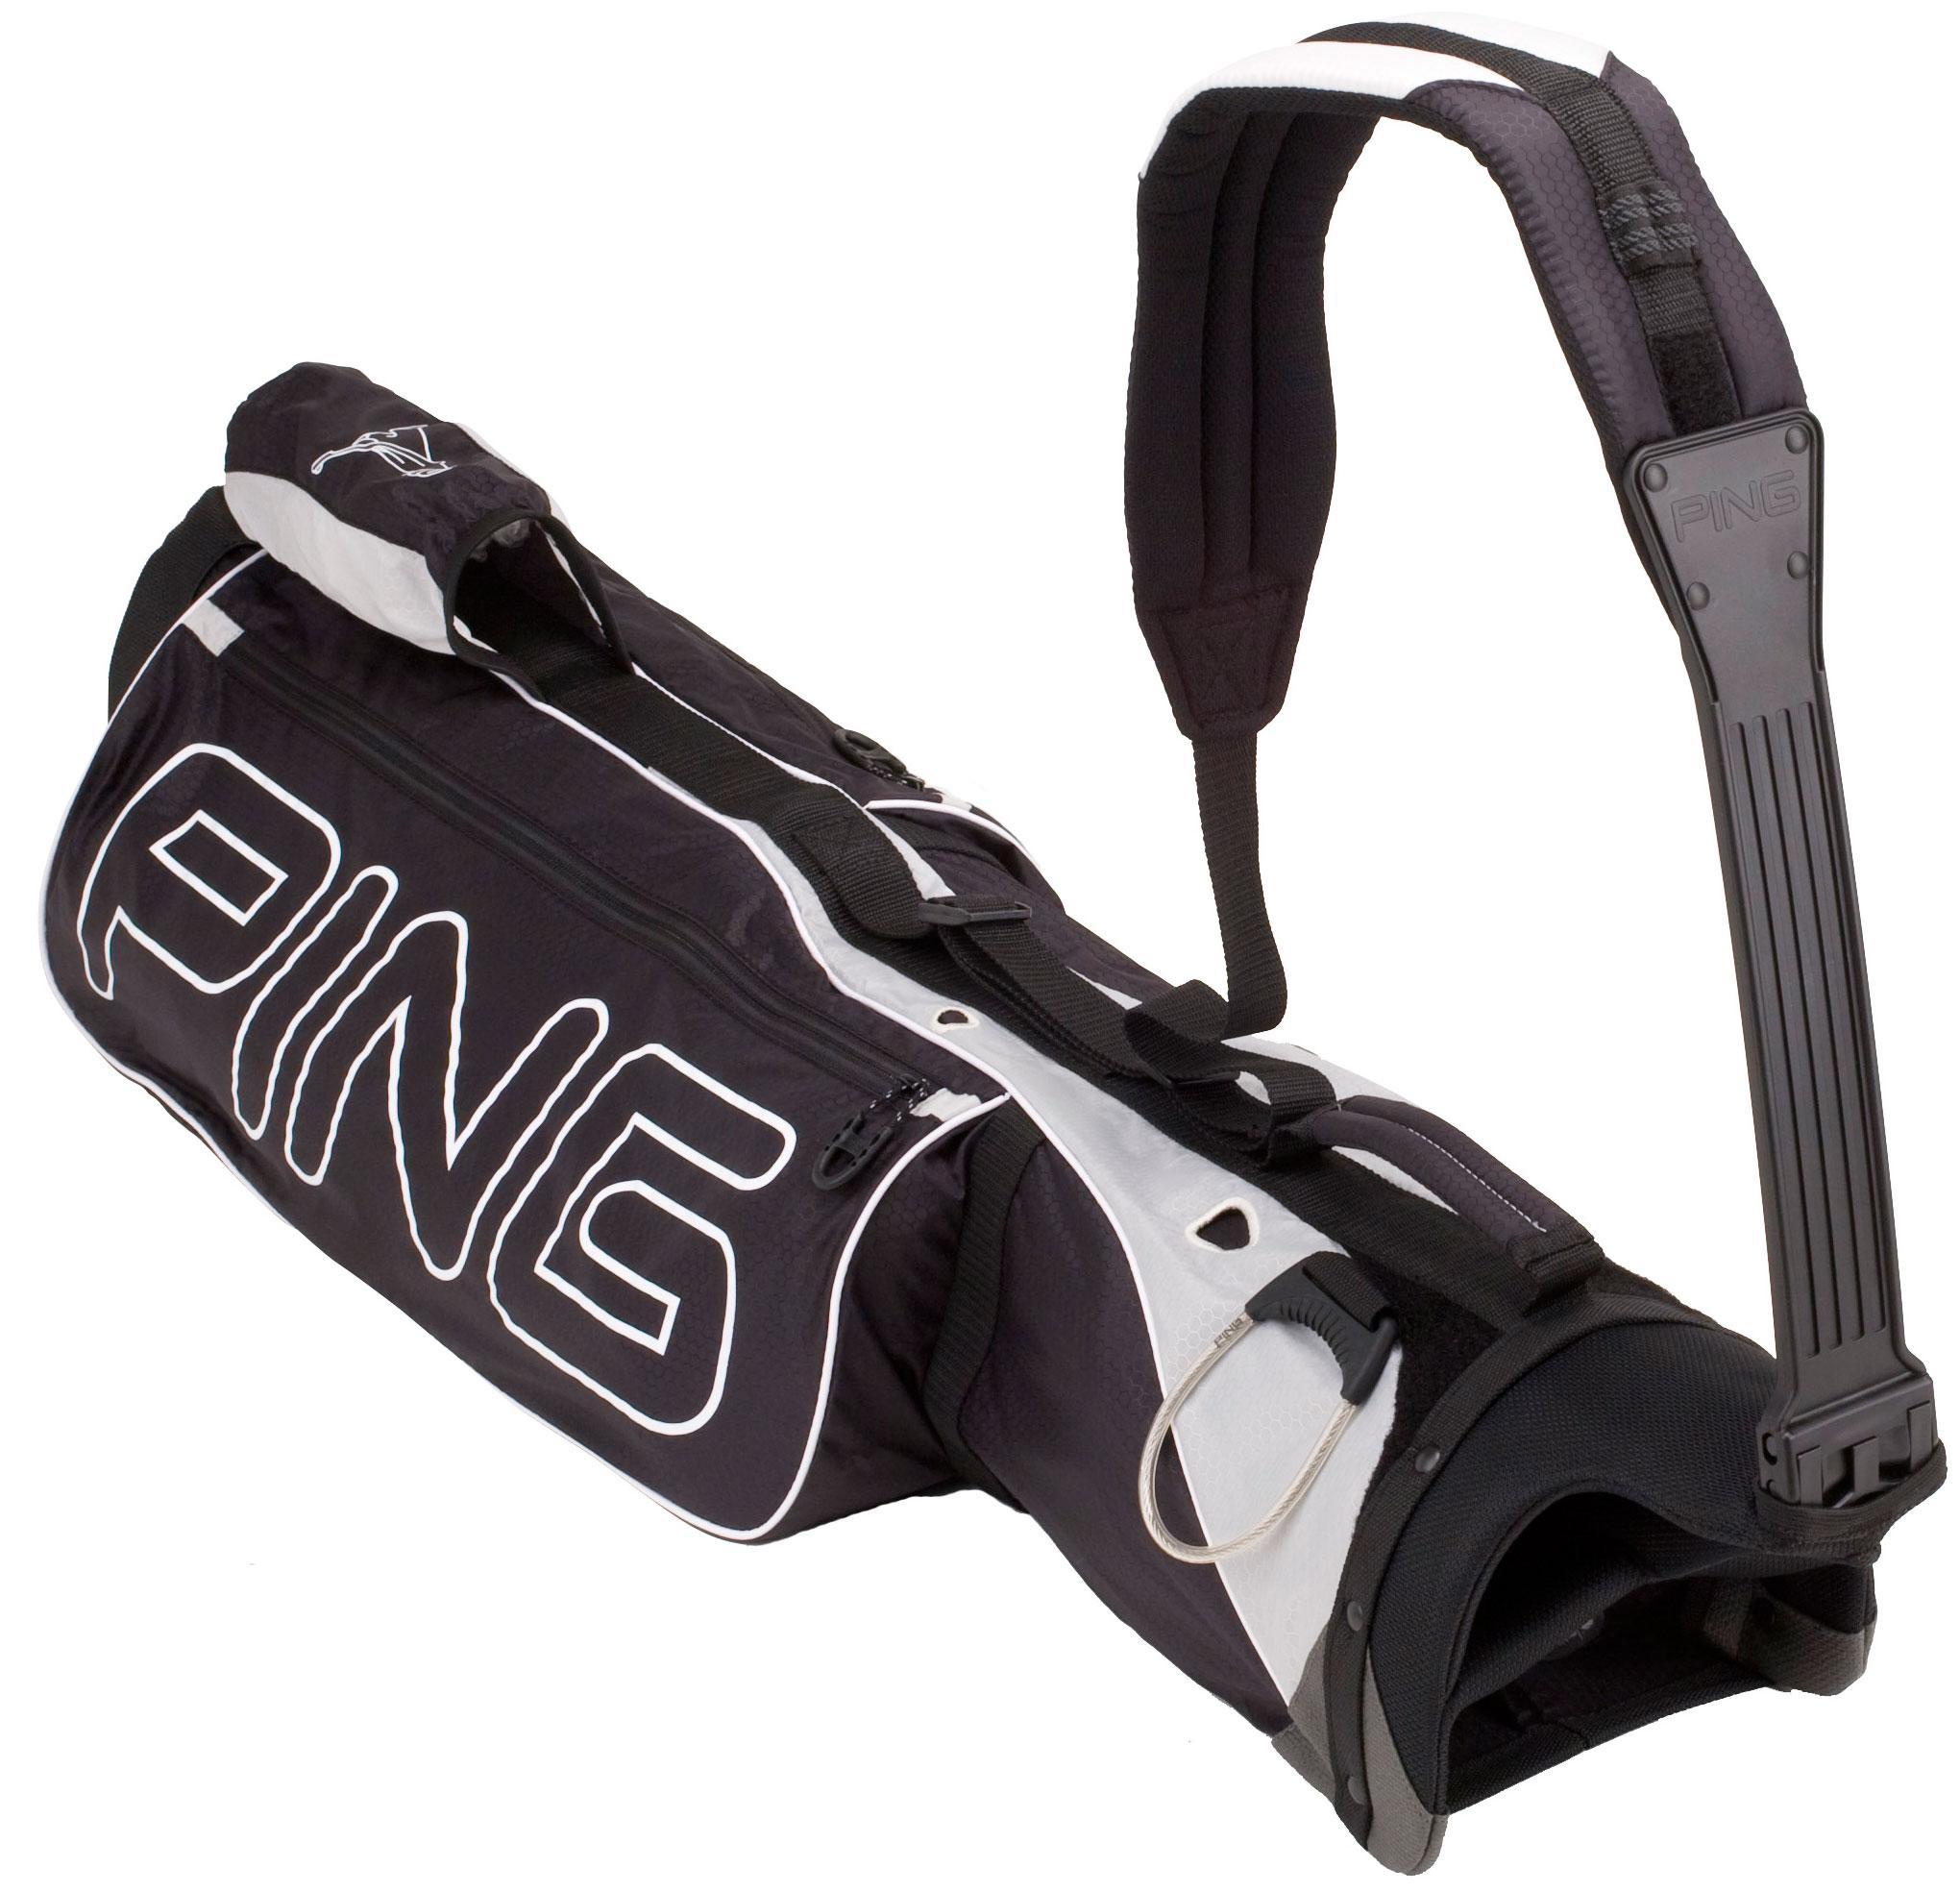 Ping Moon-Lite II Carry Bag | Discount Golf World  |Ping Moonlight Golf Bag